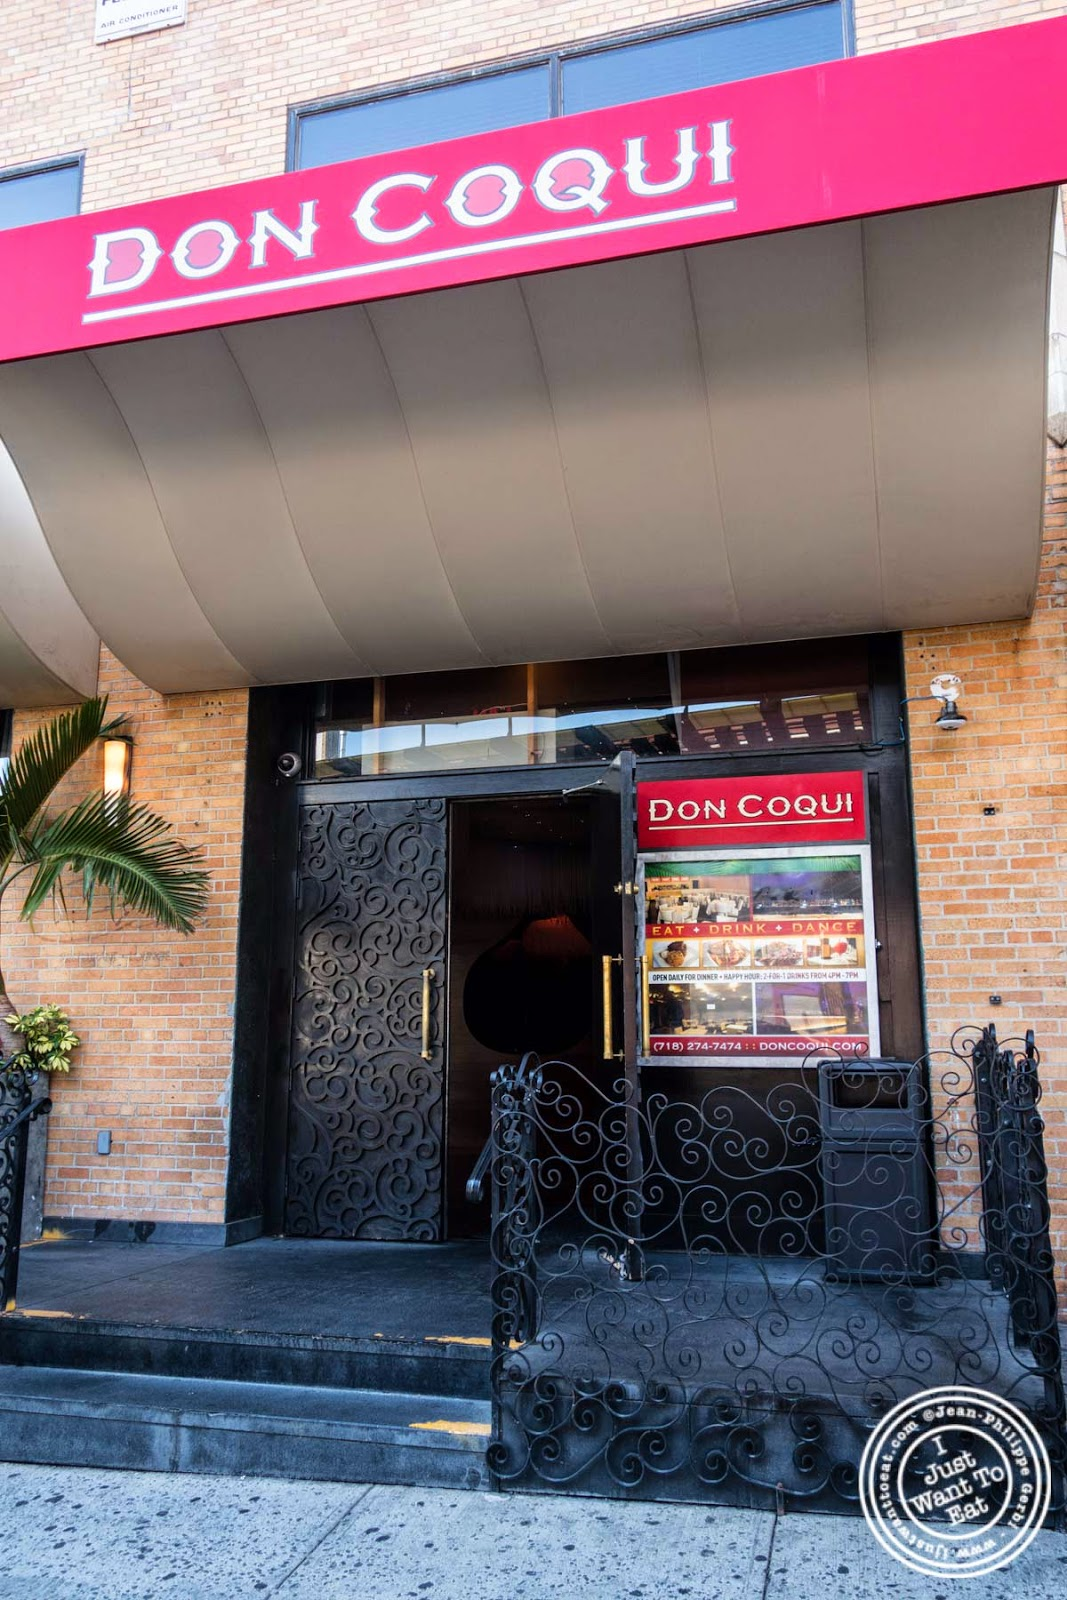 Don Coqui Puerto Rican Restaurant In Astoria Ny I Just